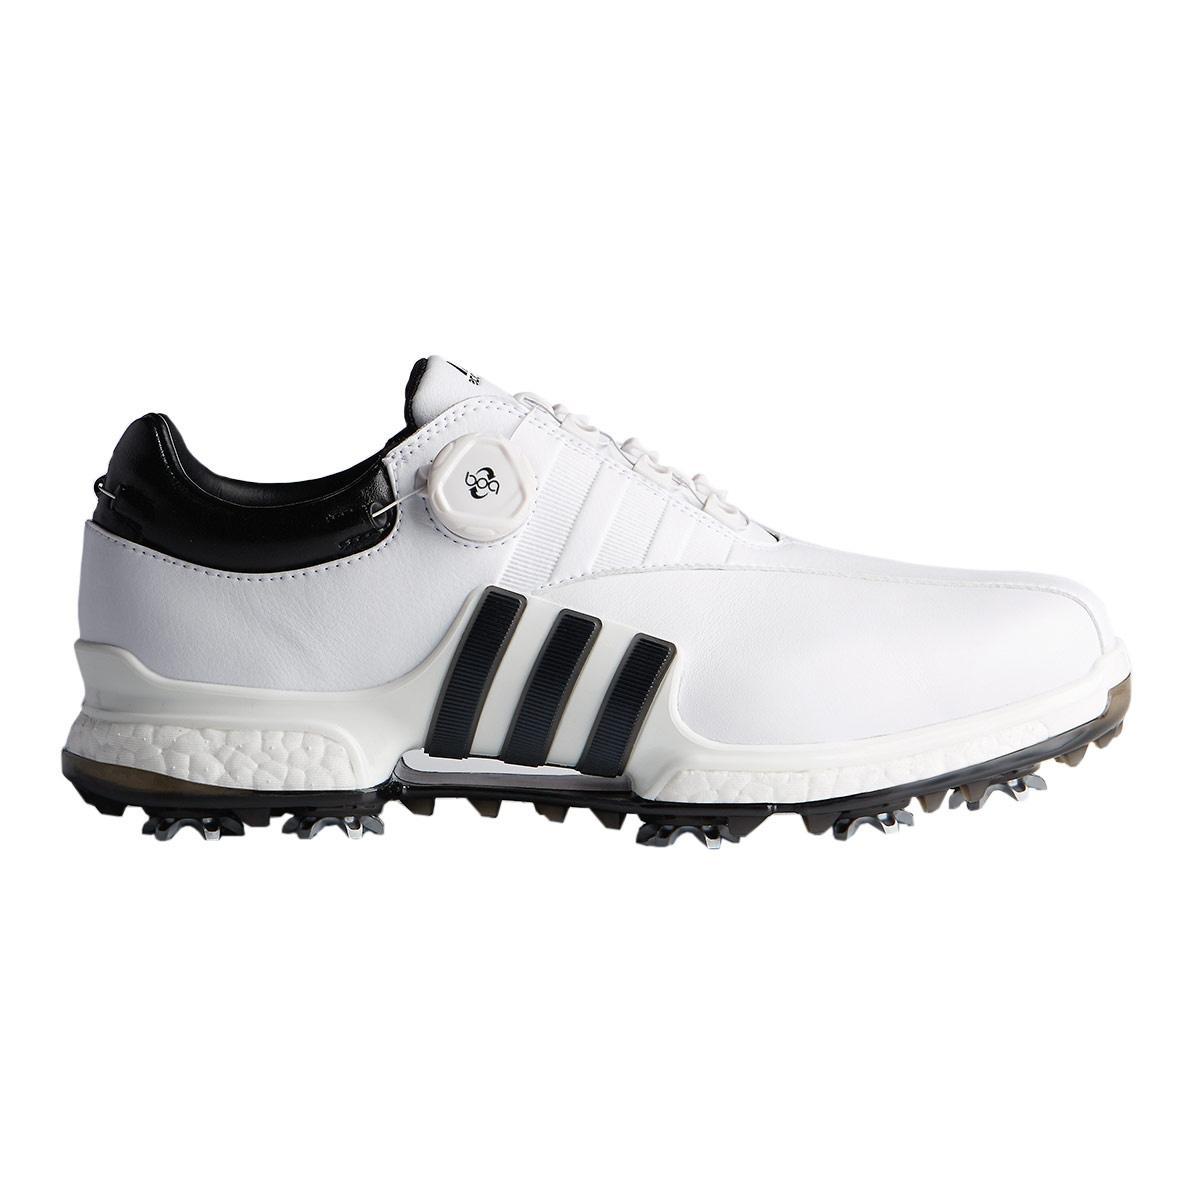 new photos best wholesaler buy cheap Chaussures adidas Golf Tour360 BOA 2.0 | Online Golf